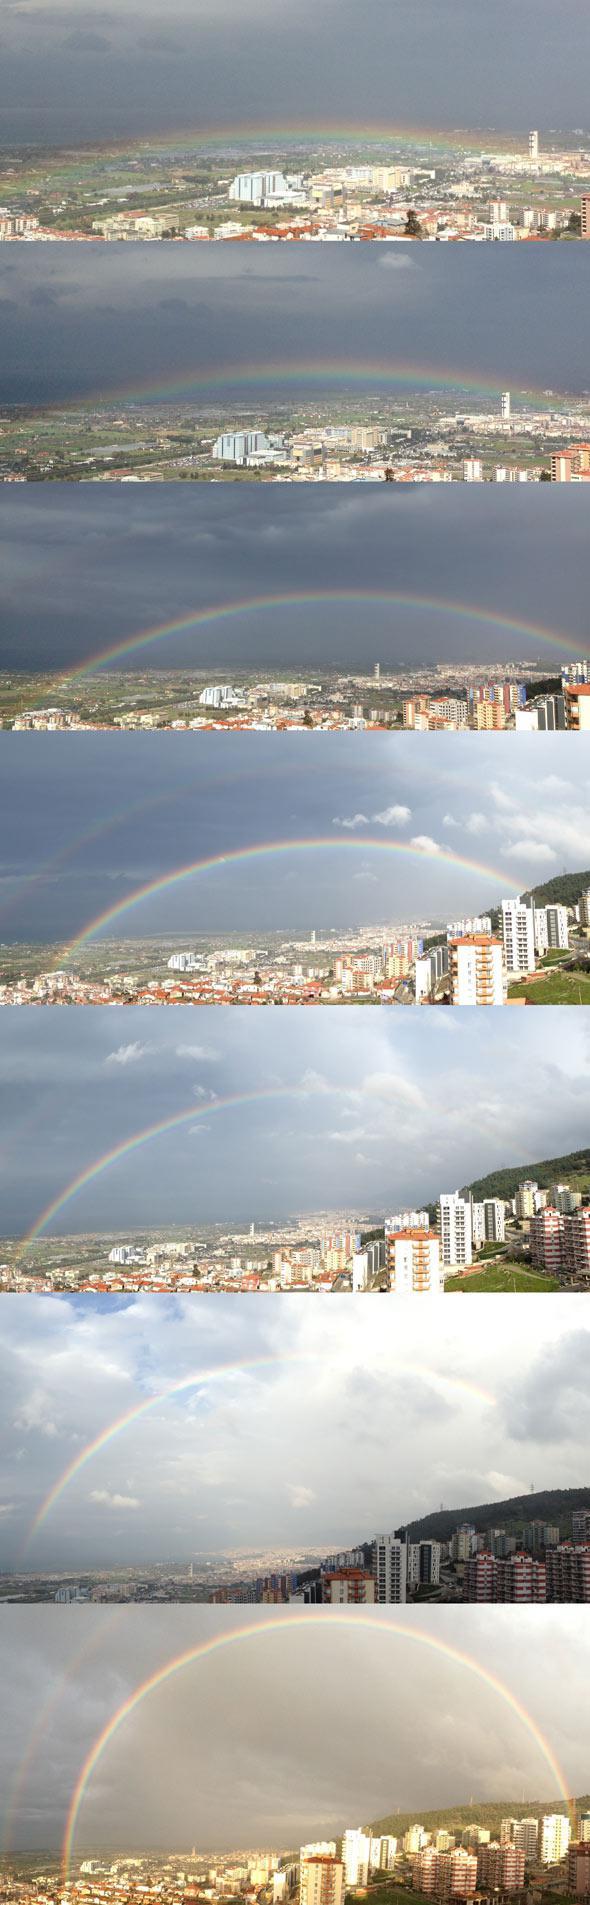 A rainbow rises